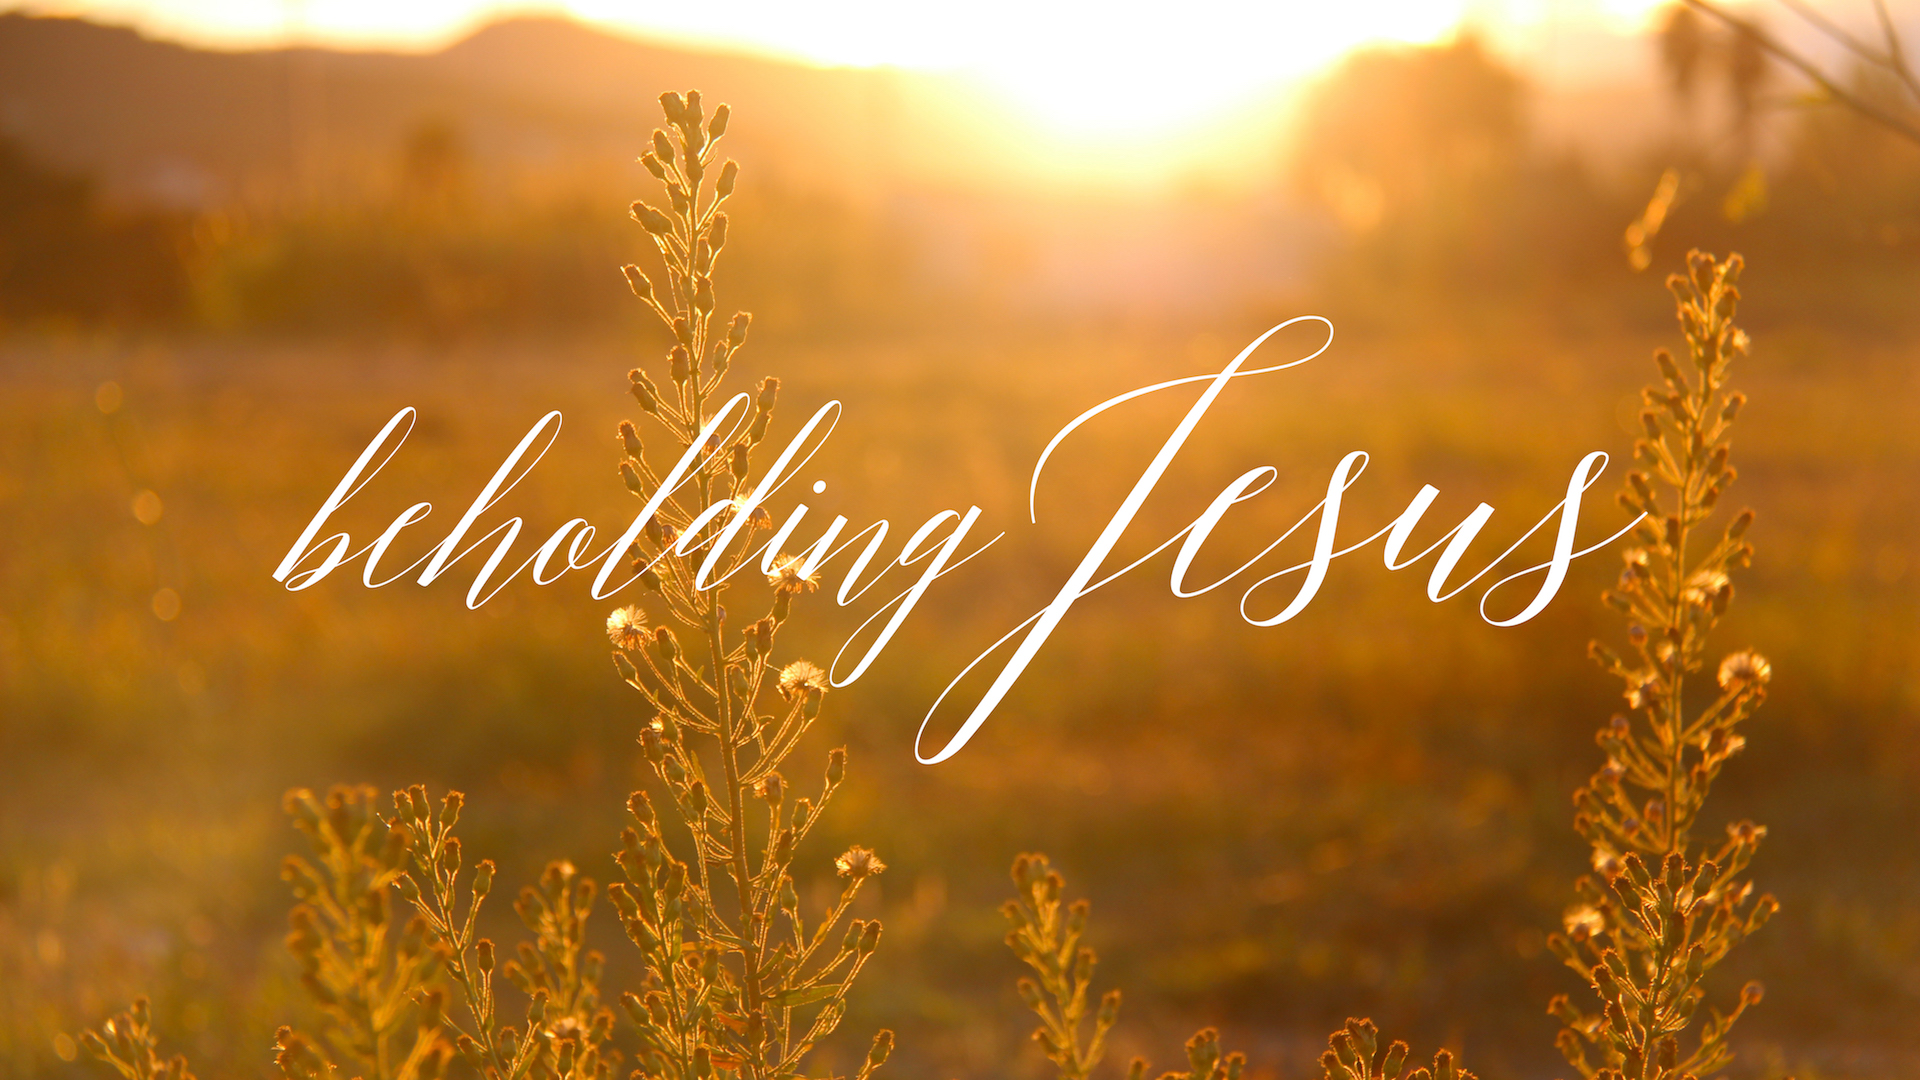 Beholding Jesus.jpg